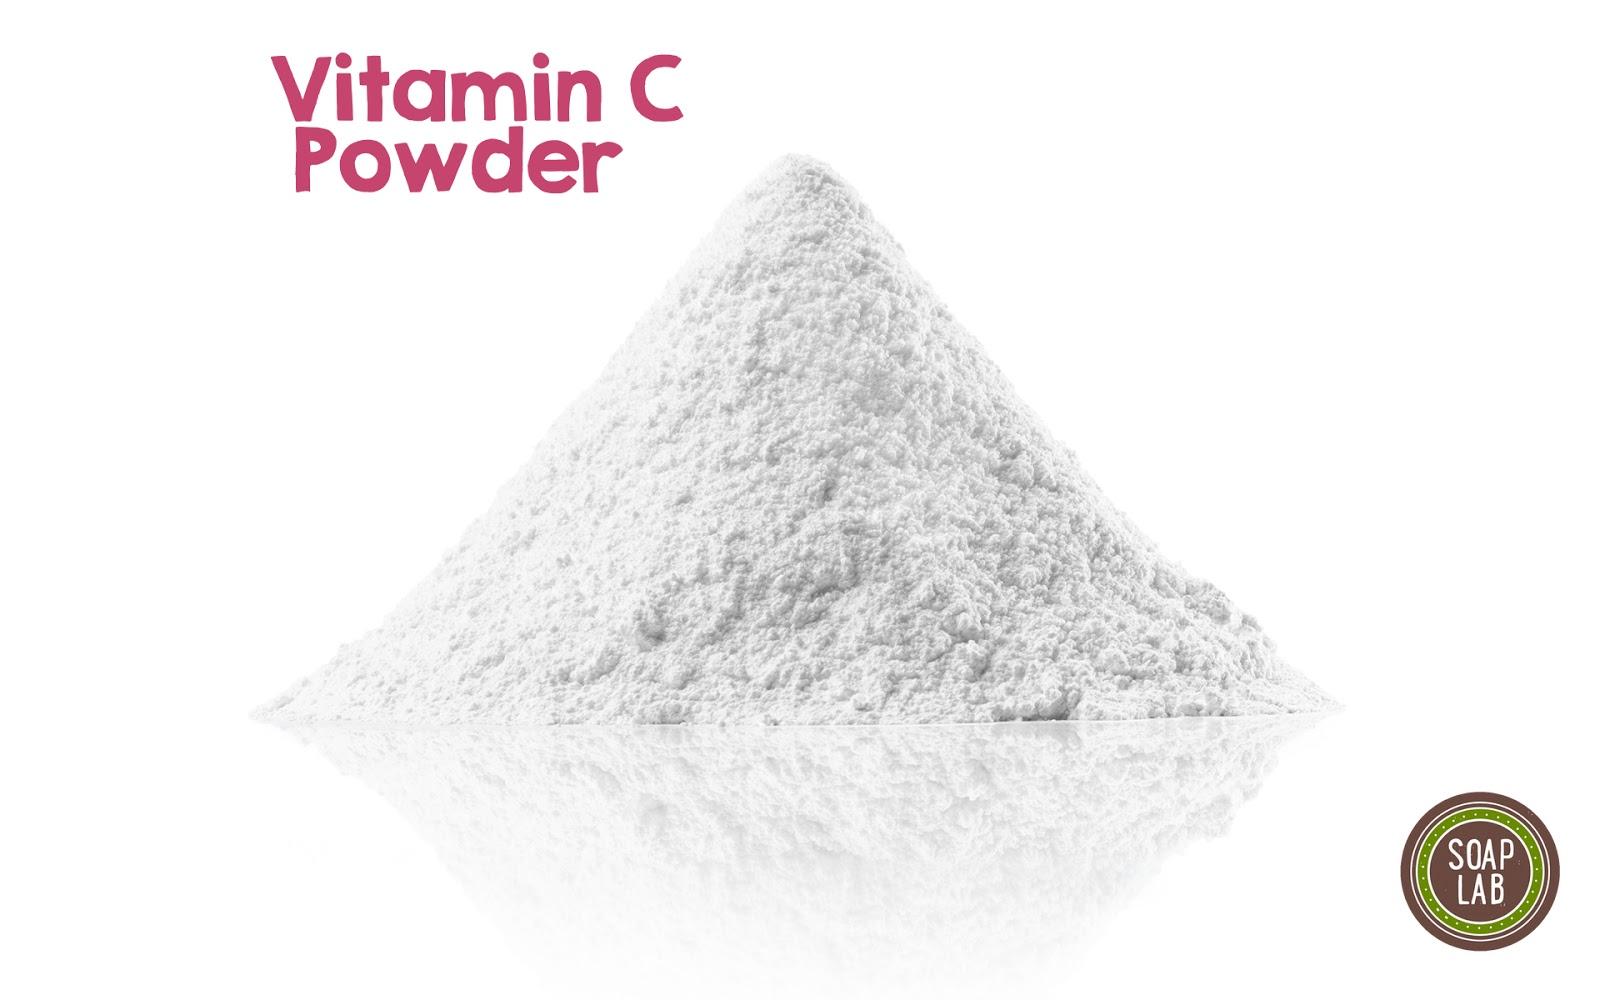 Vitamin C powder malaysia